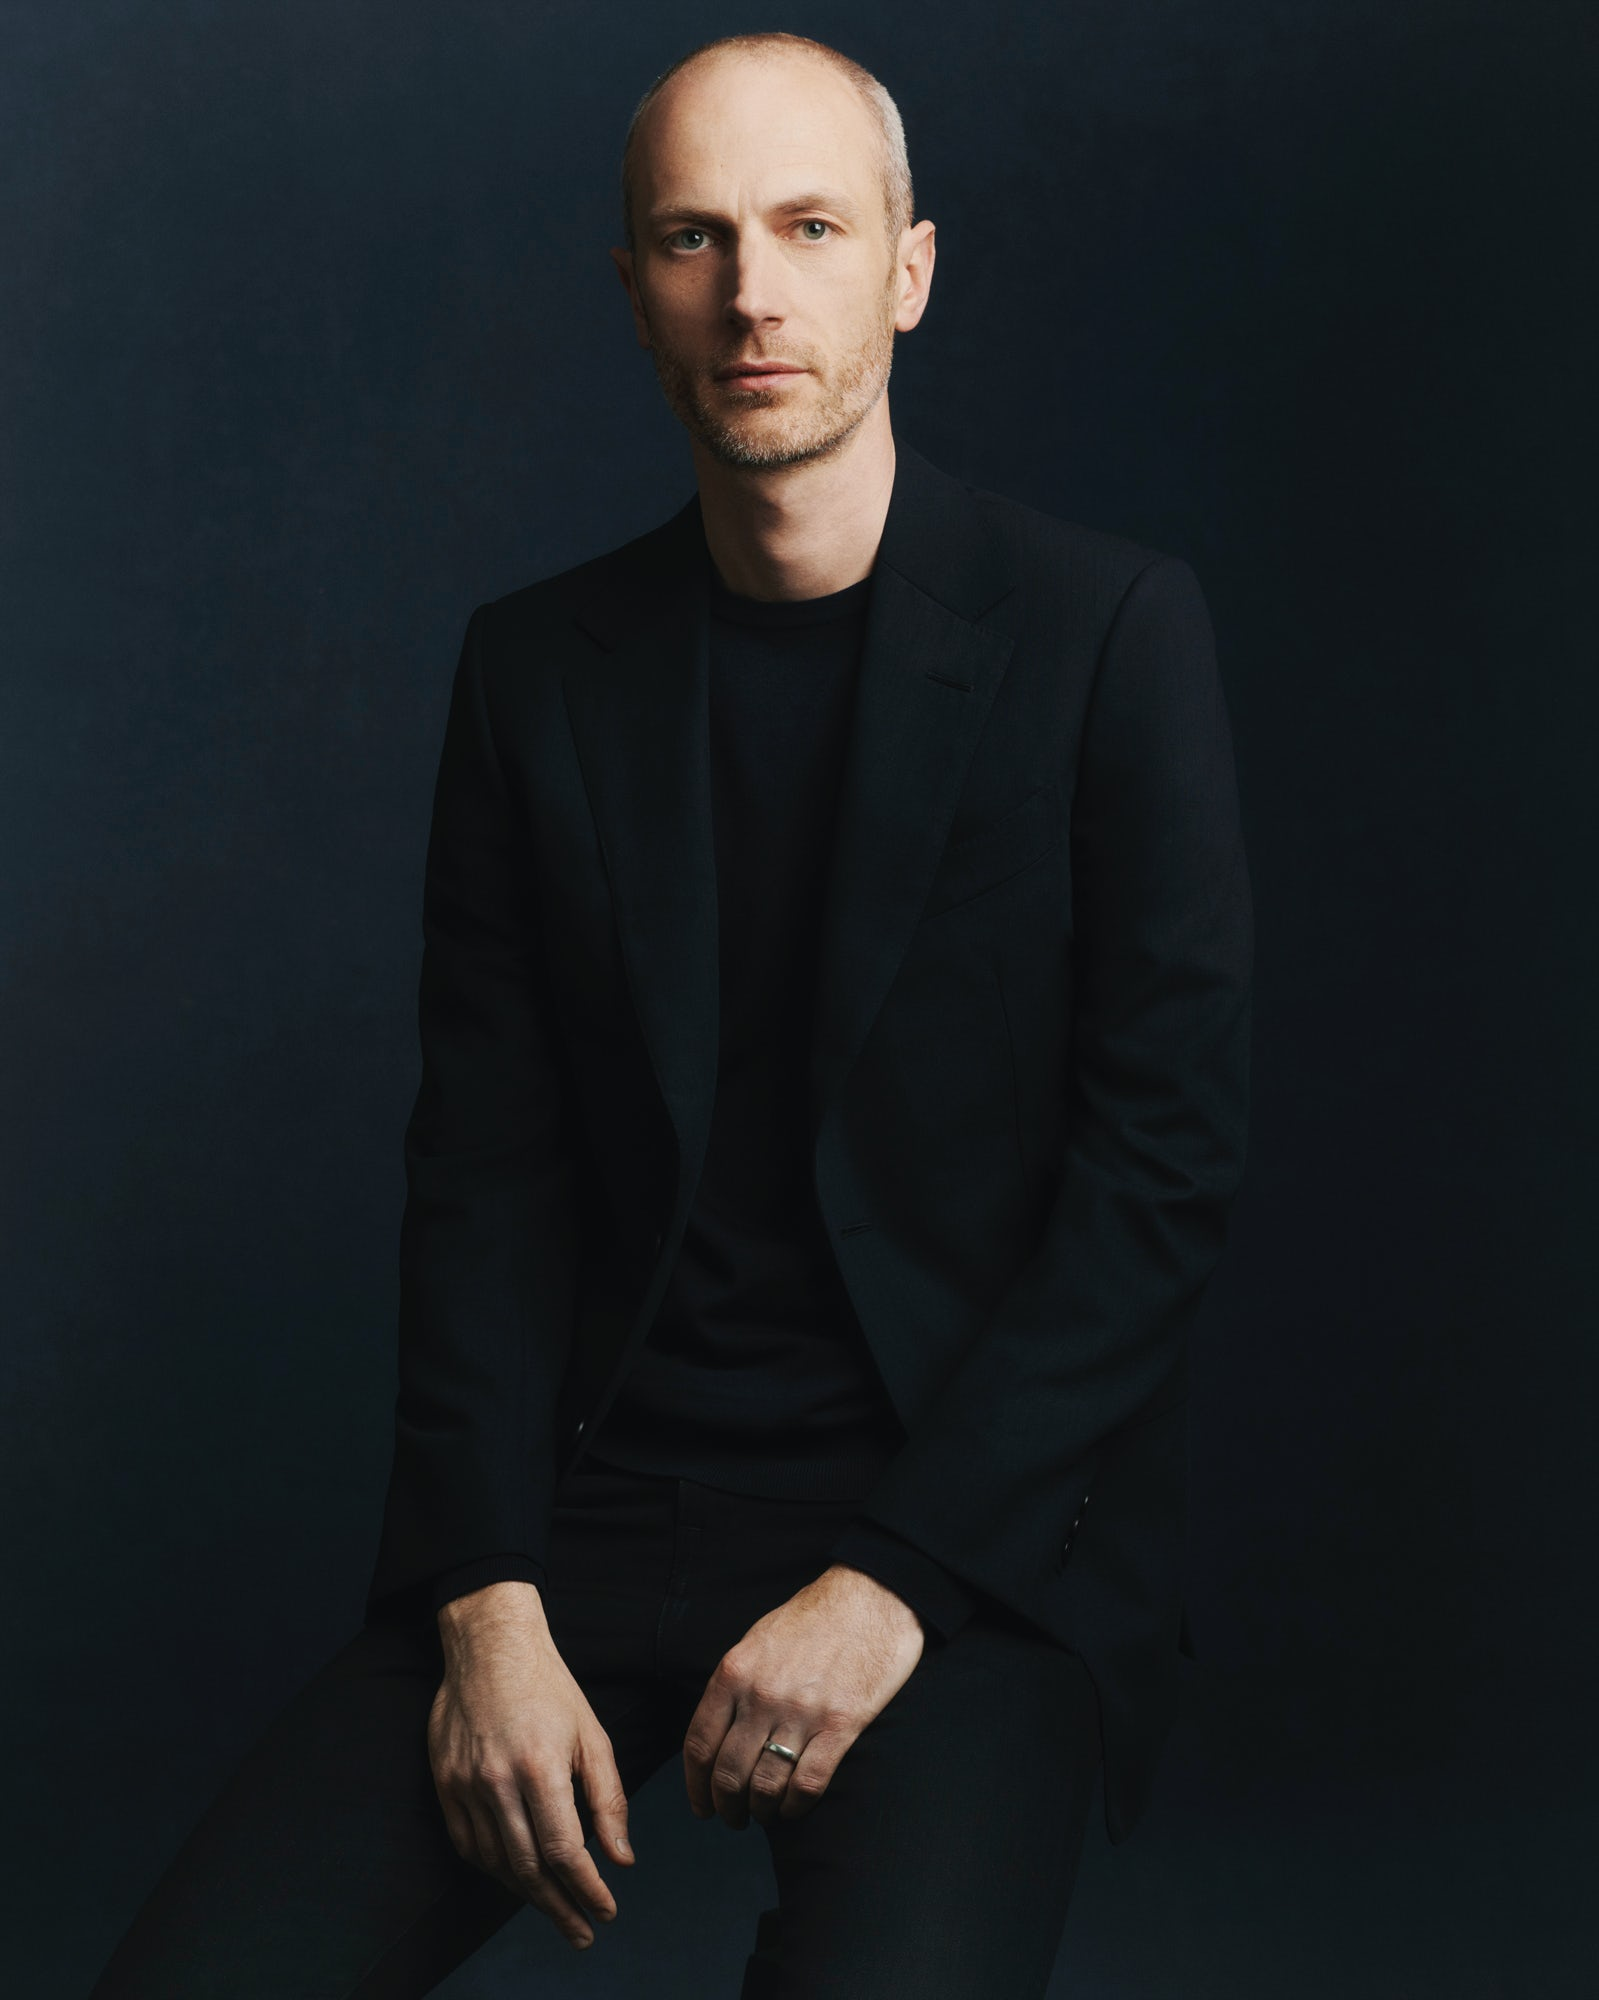 News Bites | Dunhill Names New Creative Director, Roland Mouret Exits Robert Clergerie